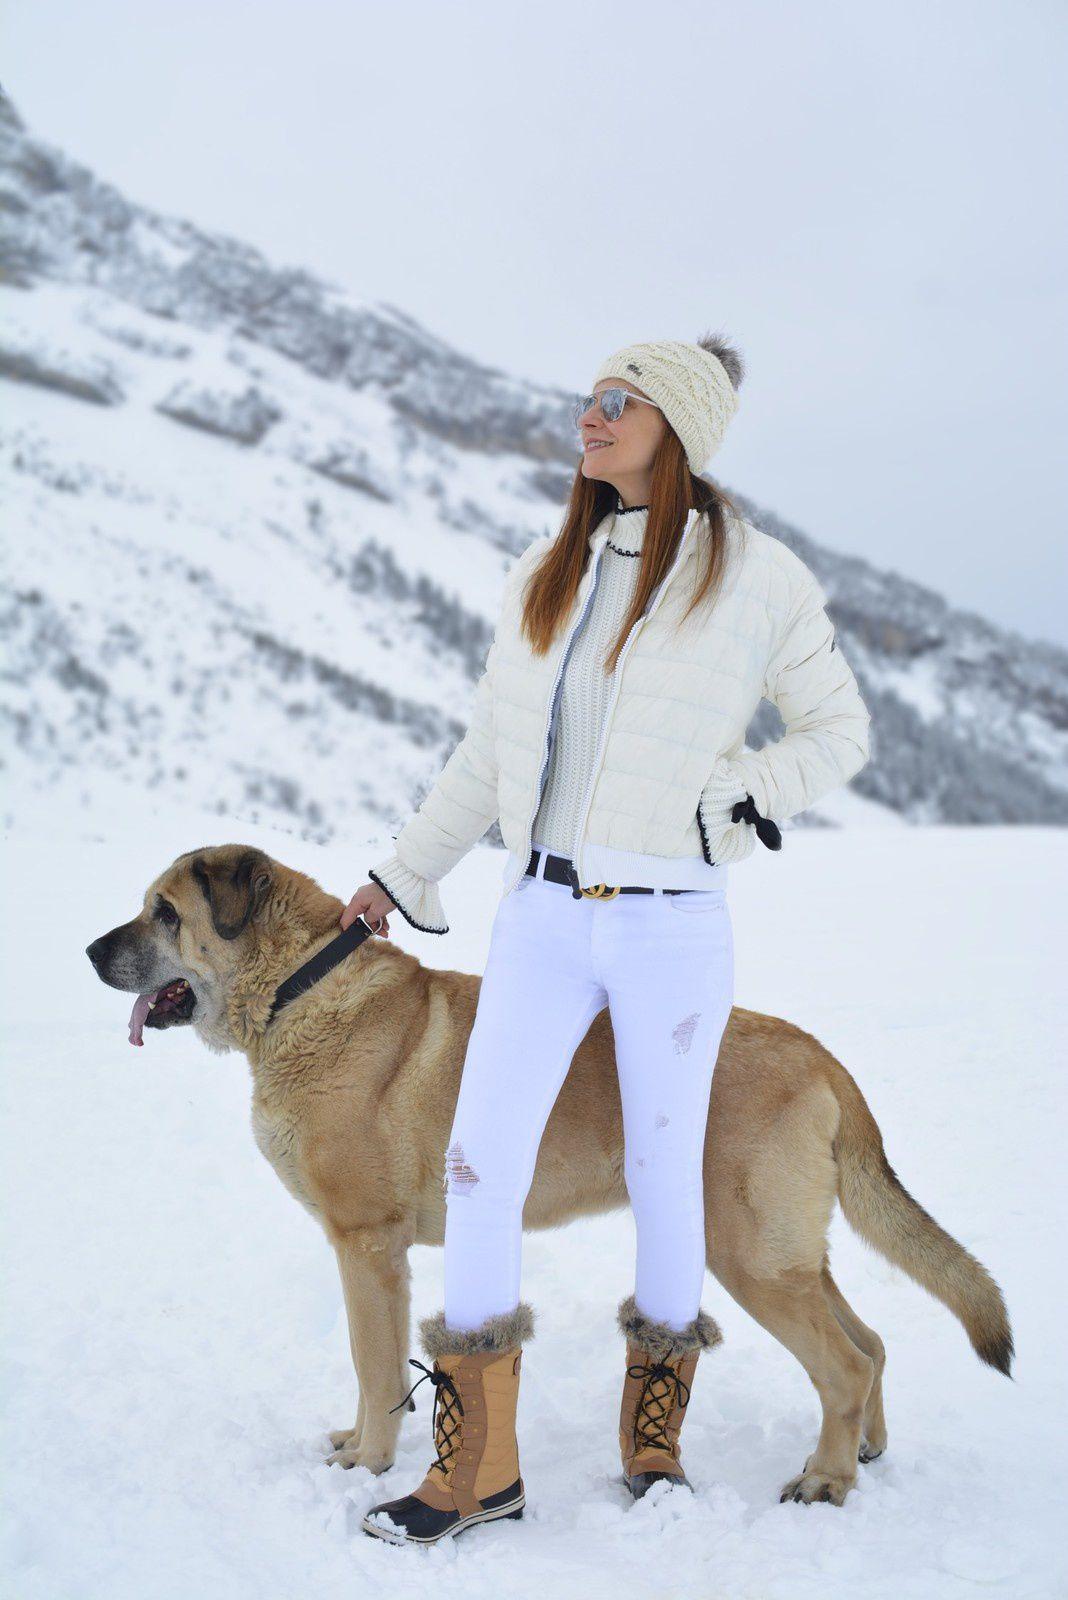 Blanc comme neige ❄️